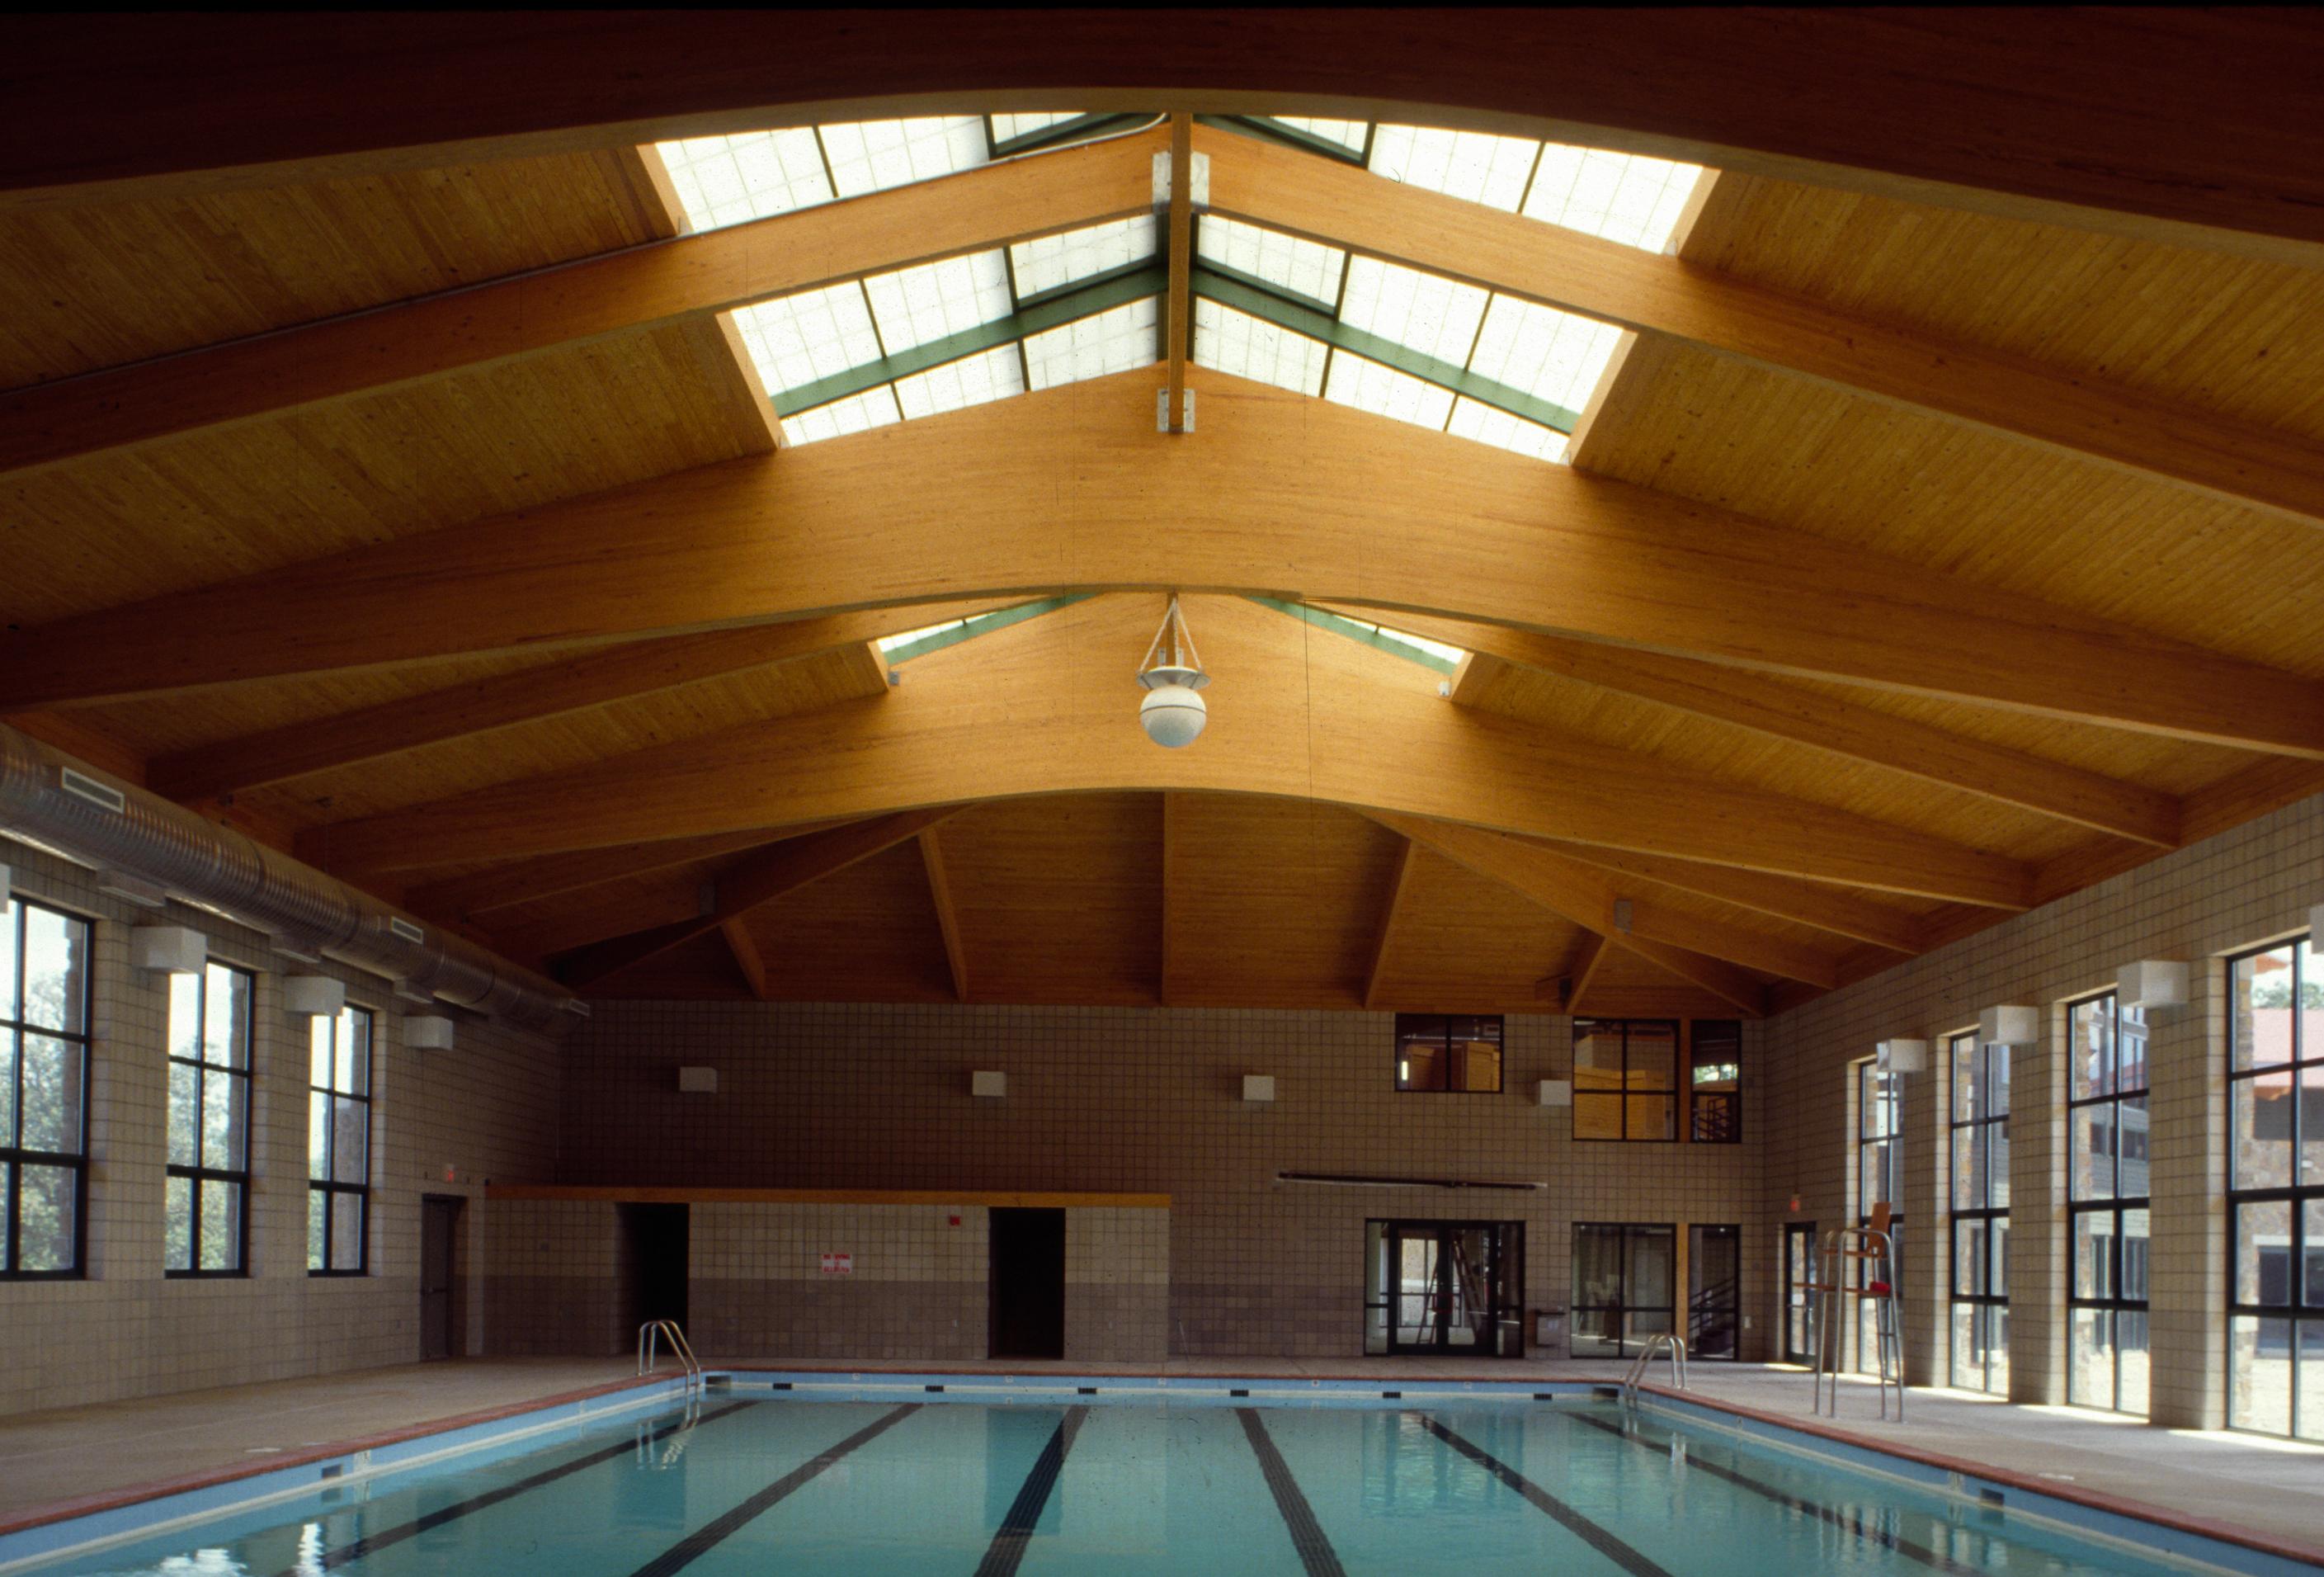 Jim Dailey Fitness & Aquatic Center